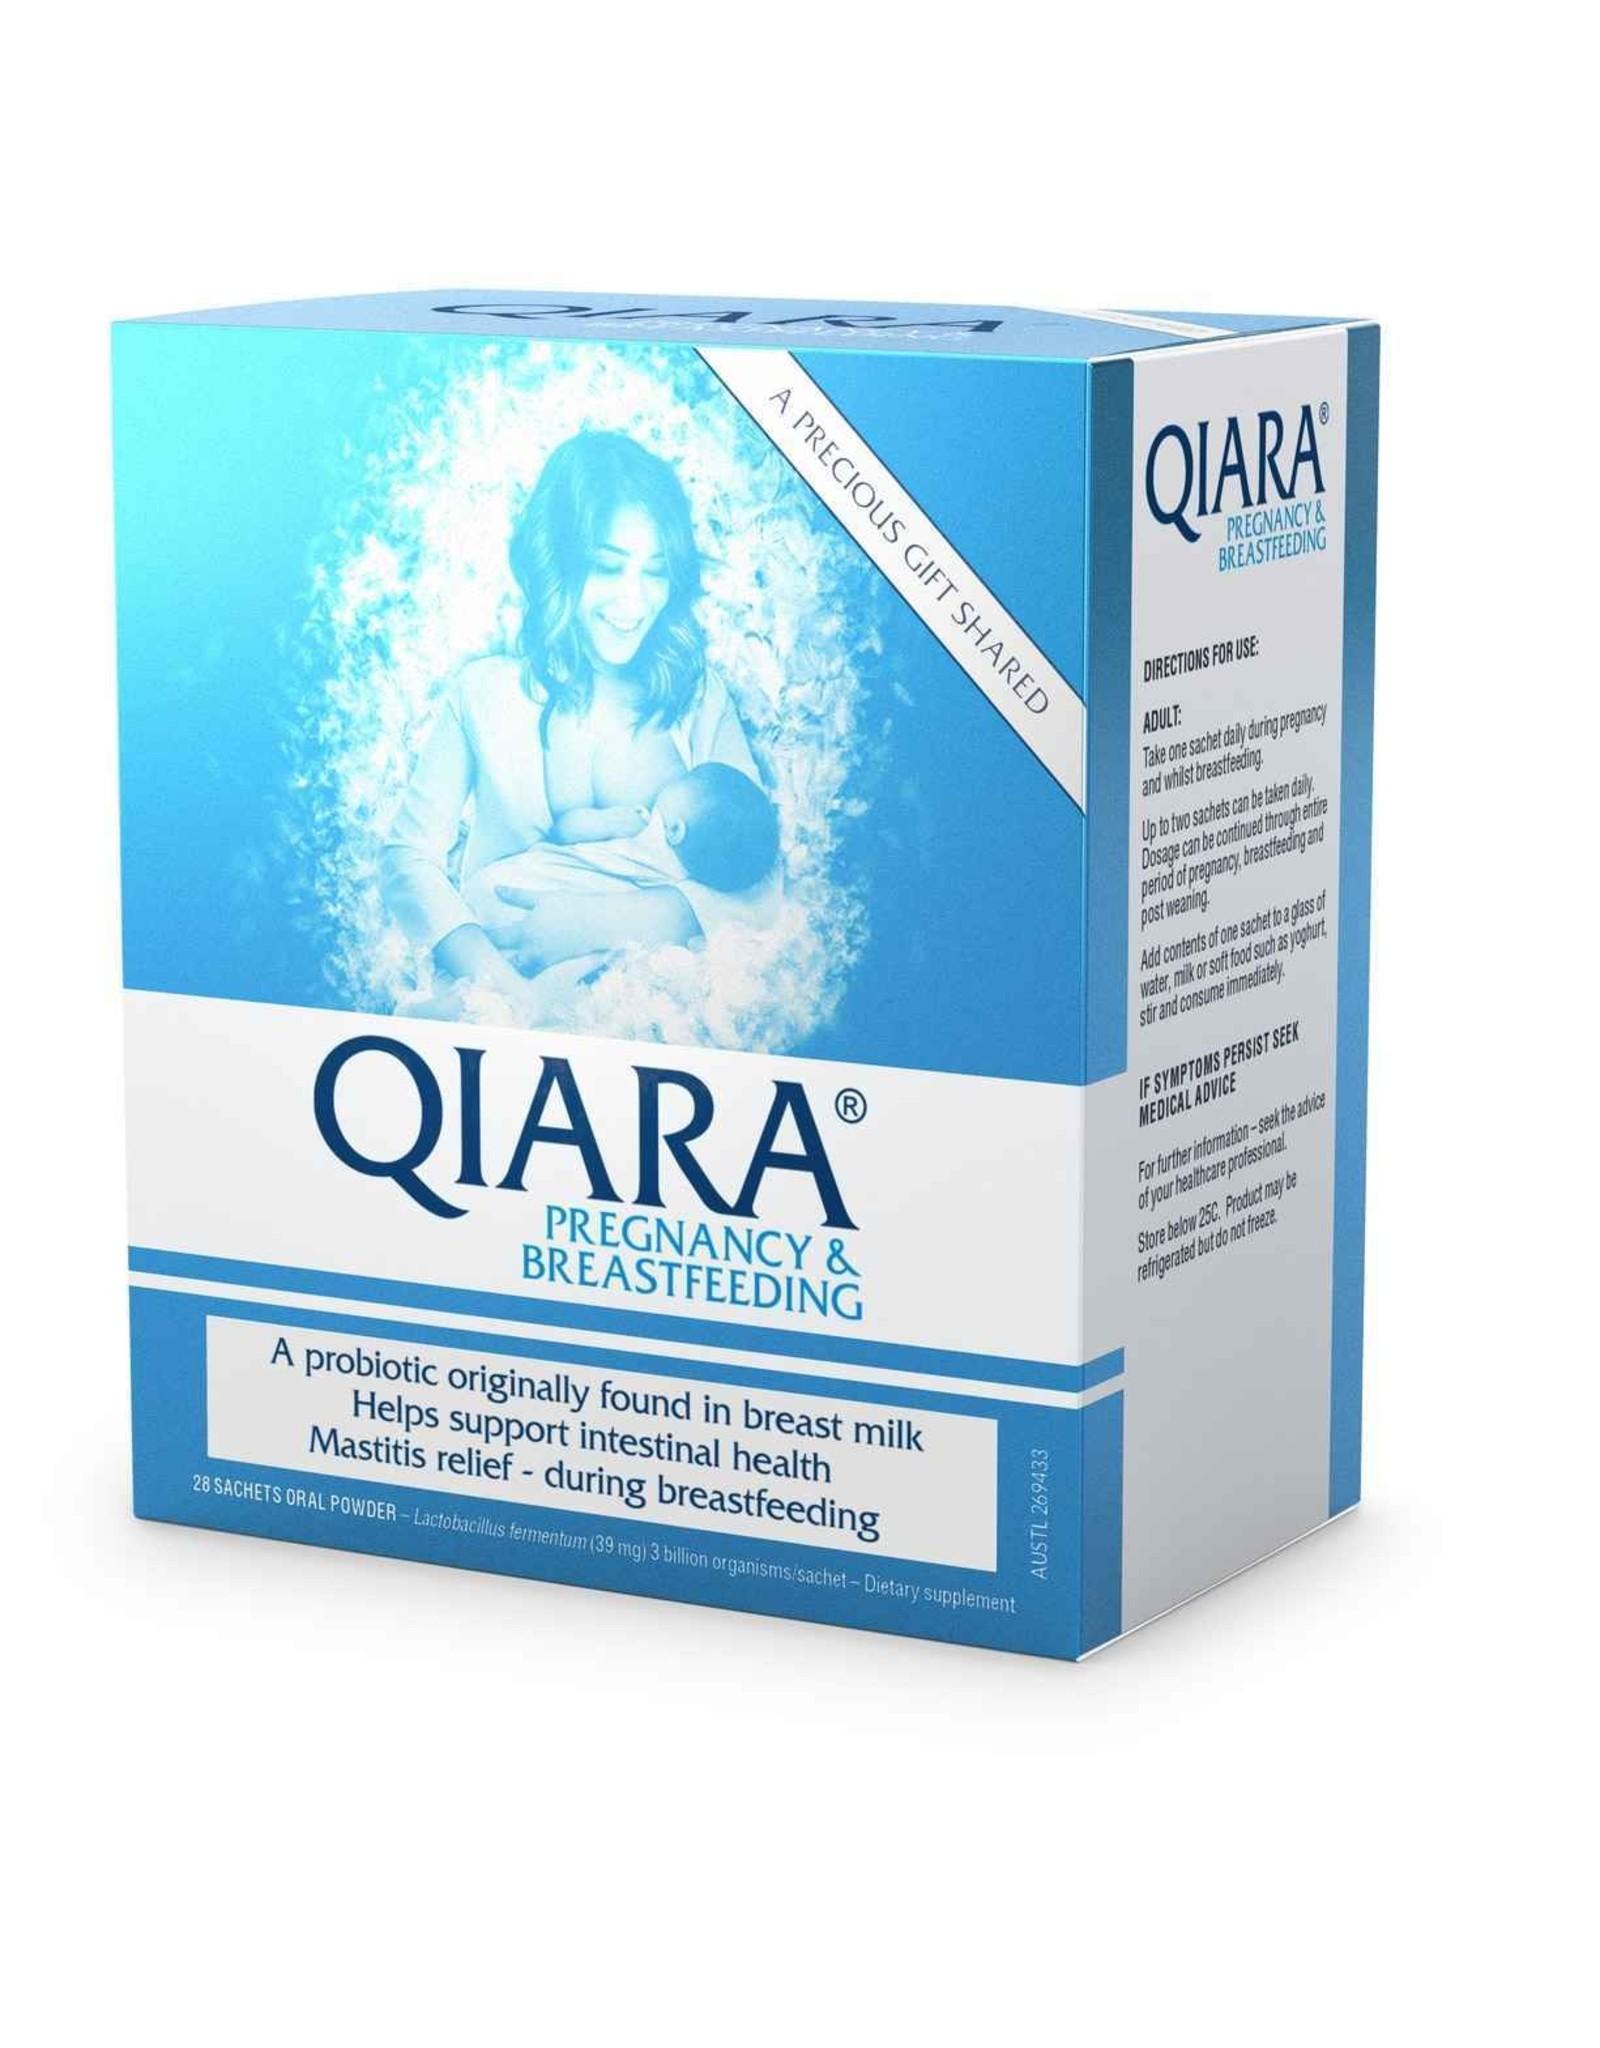 Qiara QIARA Pregnancy and Breastfeeding 28 Sachets